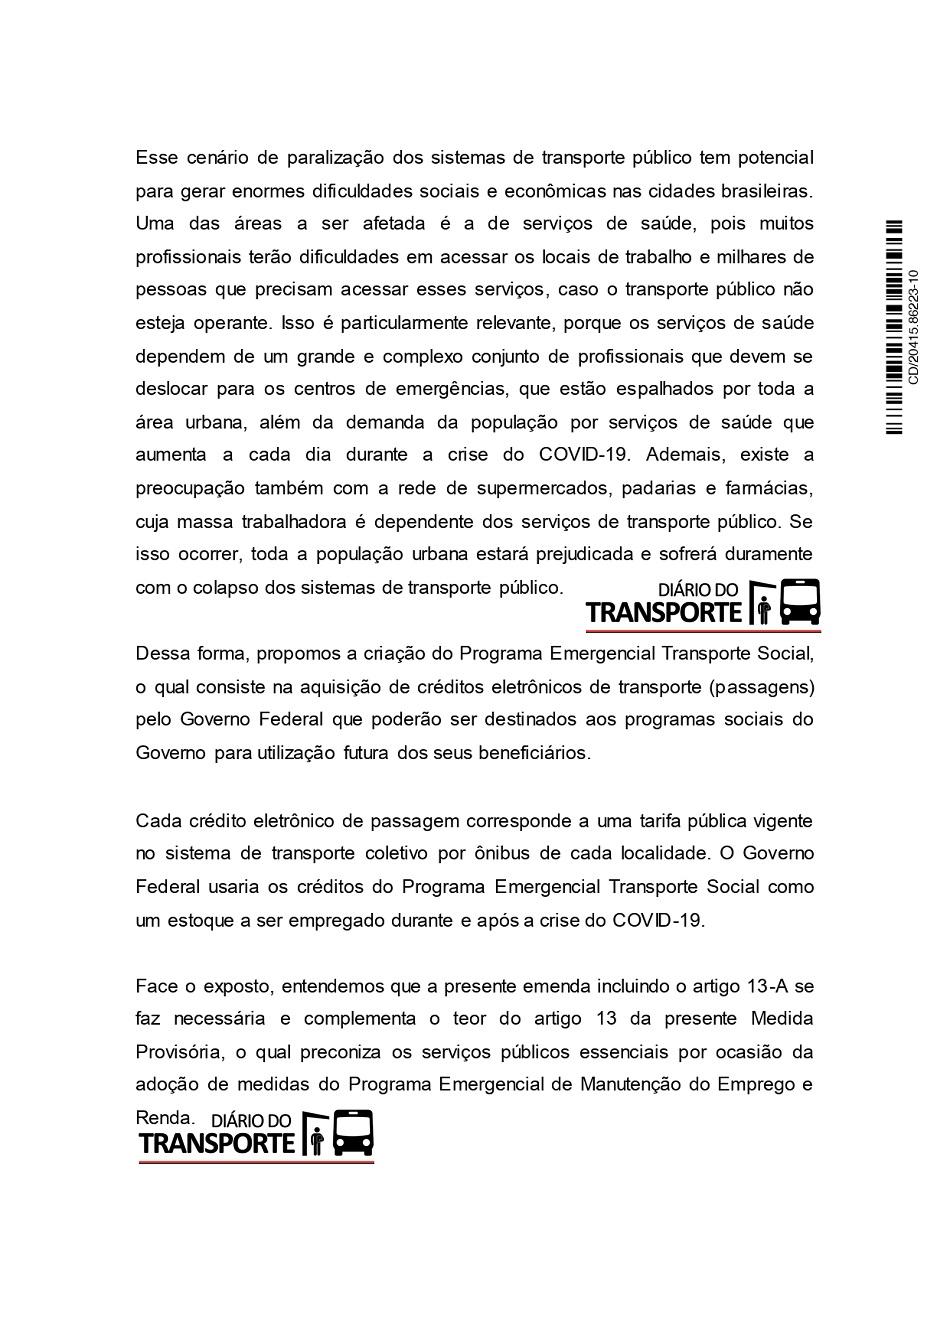 DOC-EMENDA 26 - MPV 9362020-20200402_04